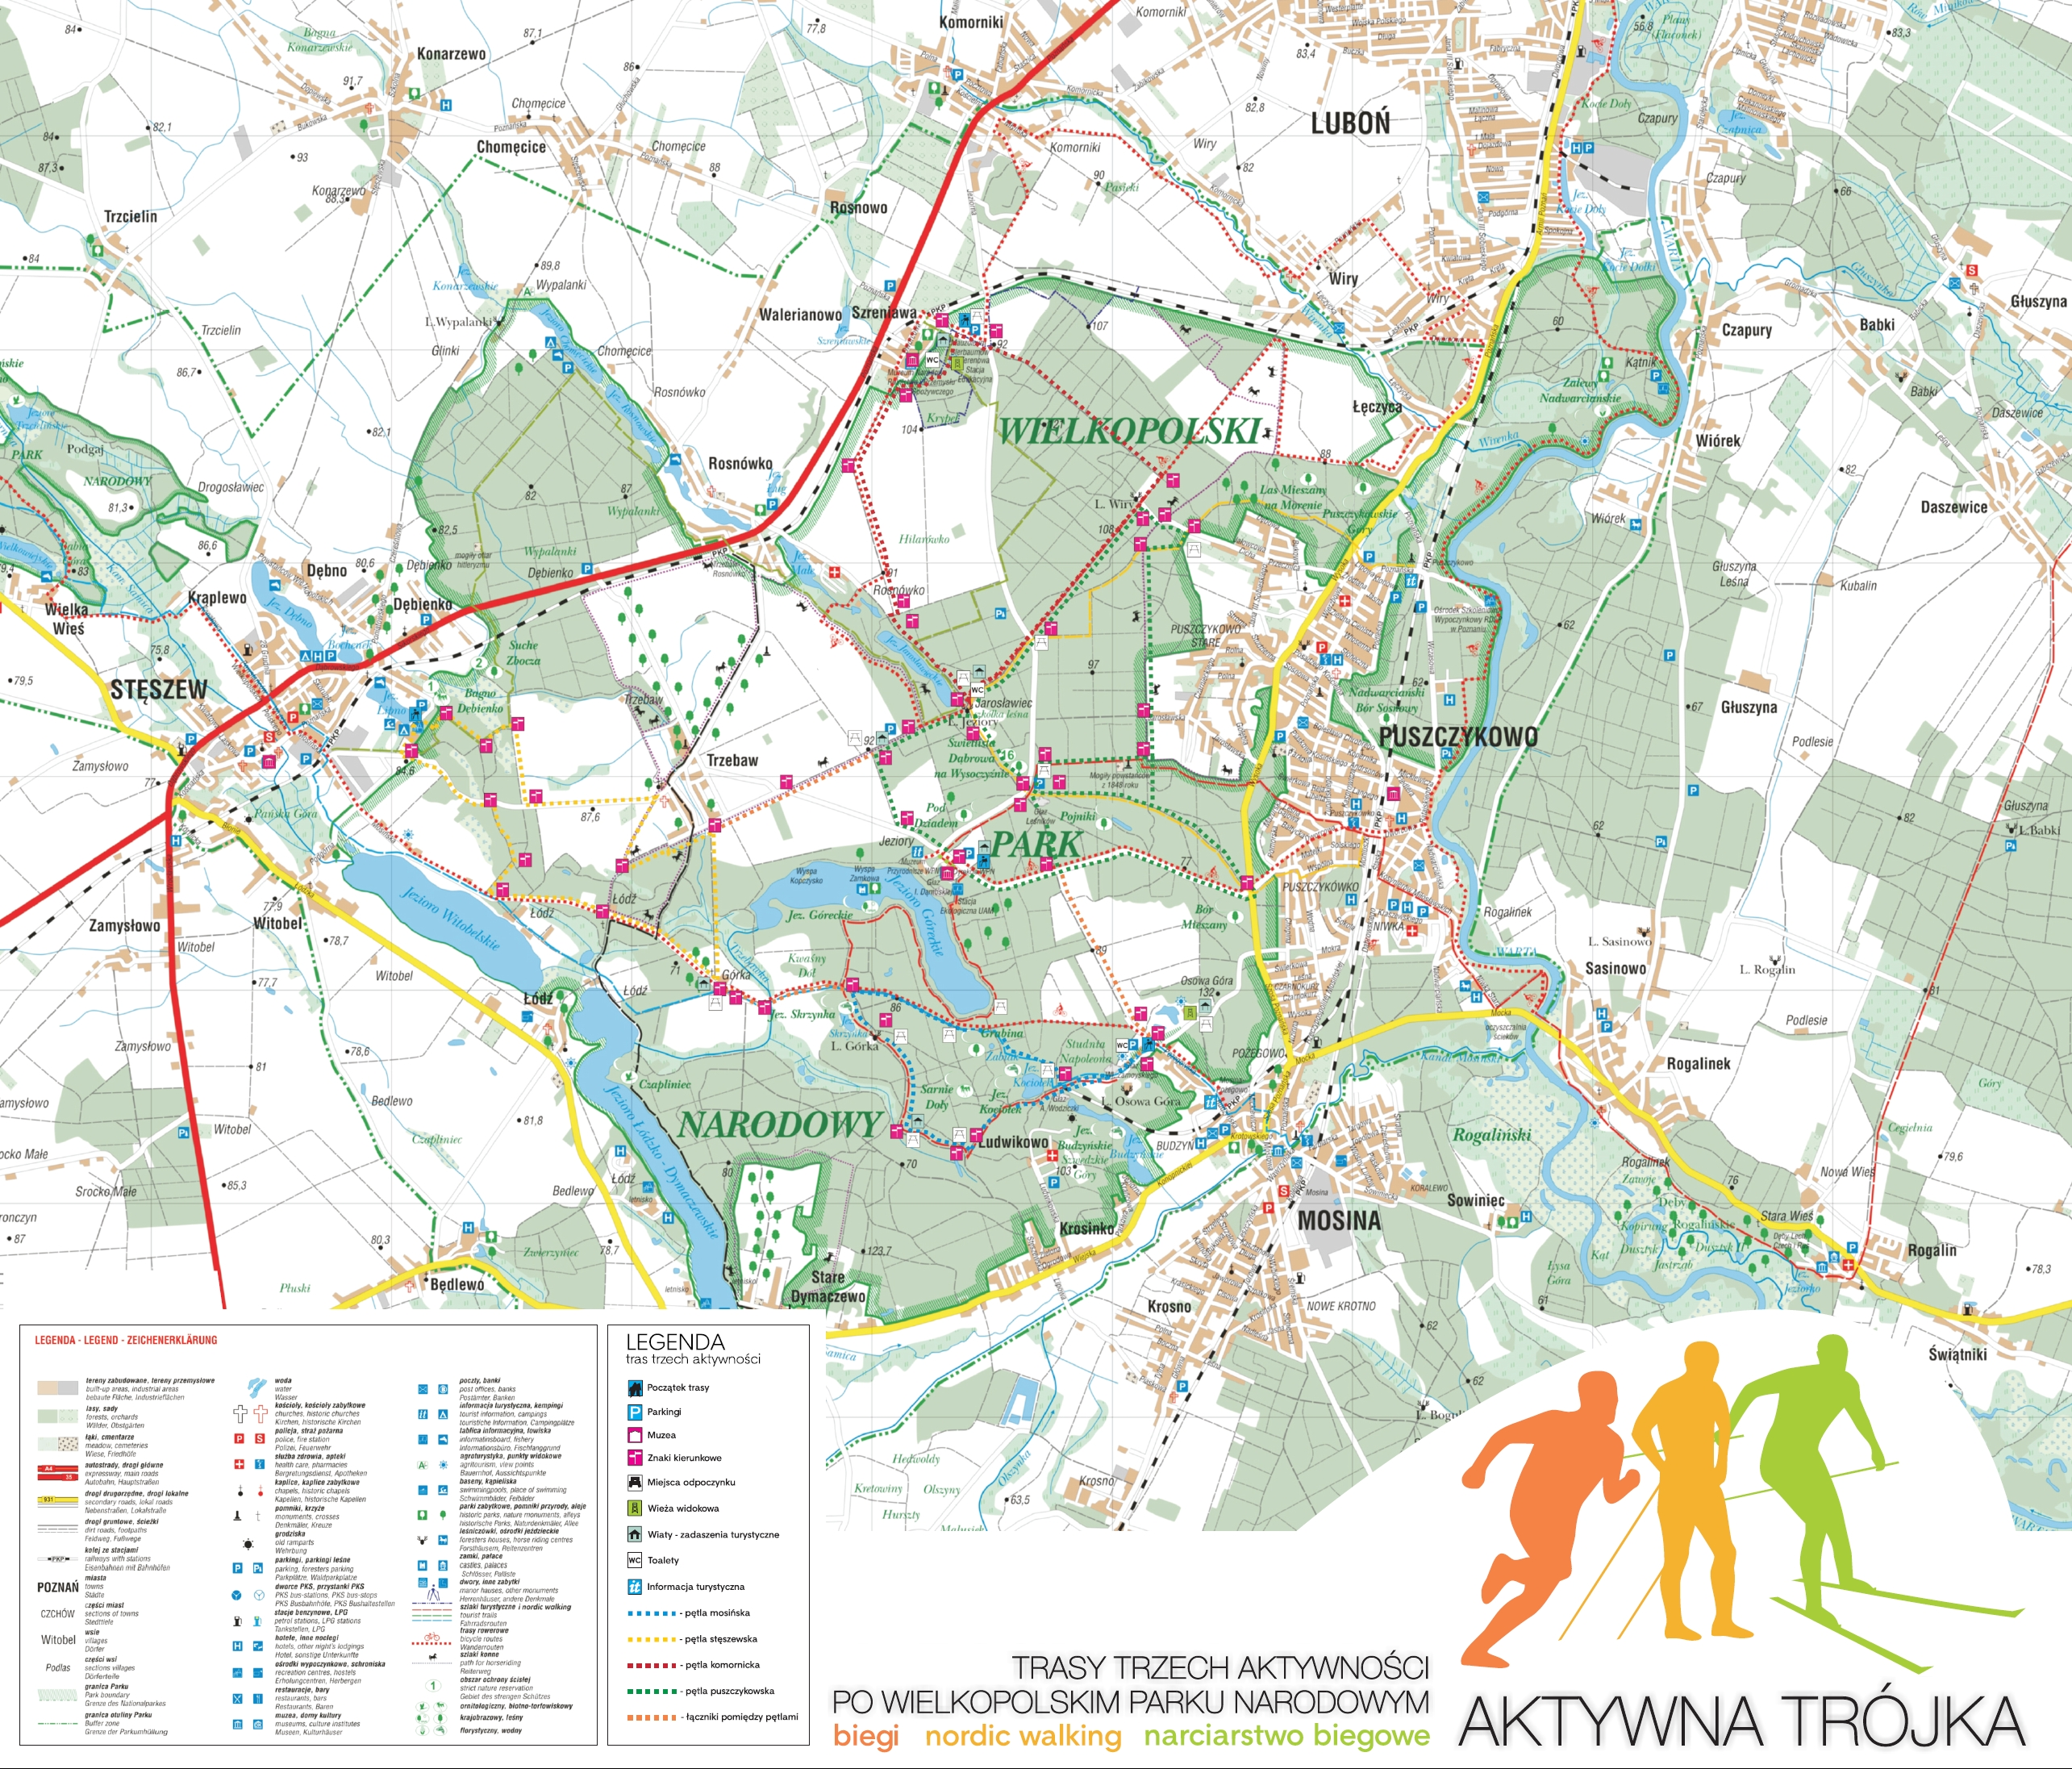 - mapa3_strona.jpg